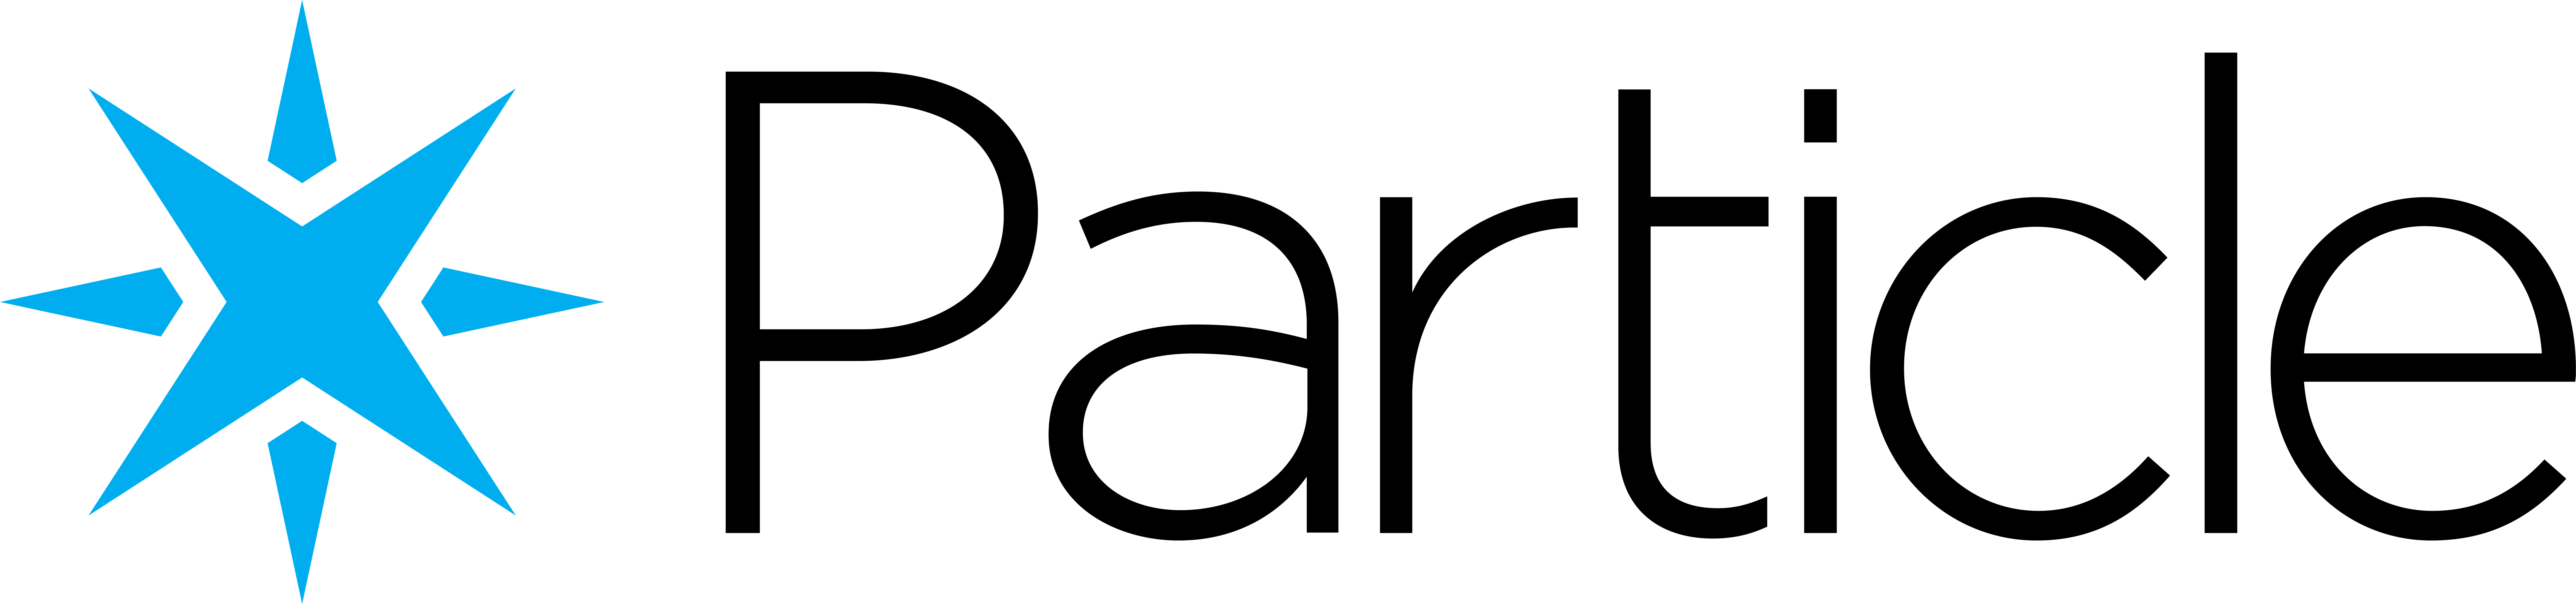 Рис. 5. Particle